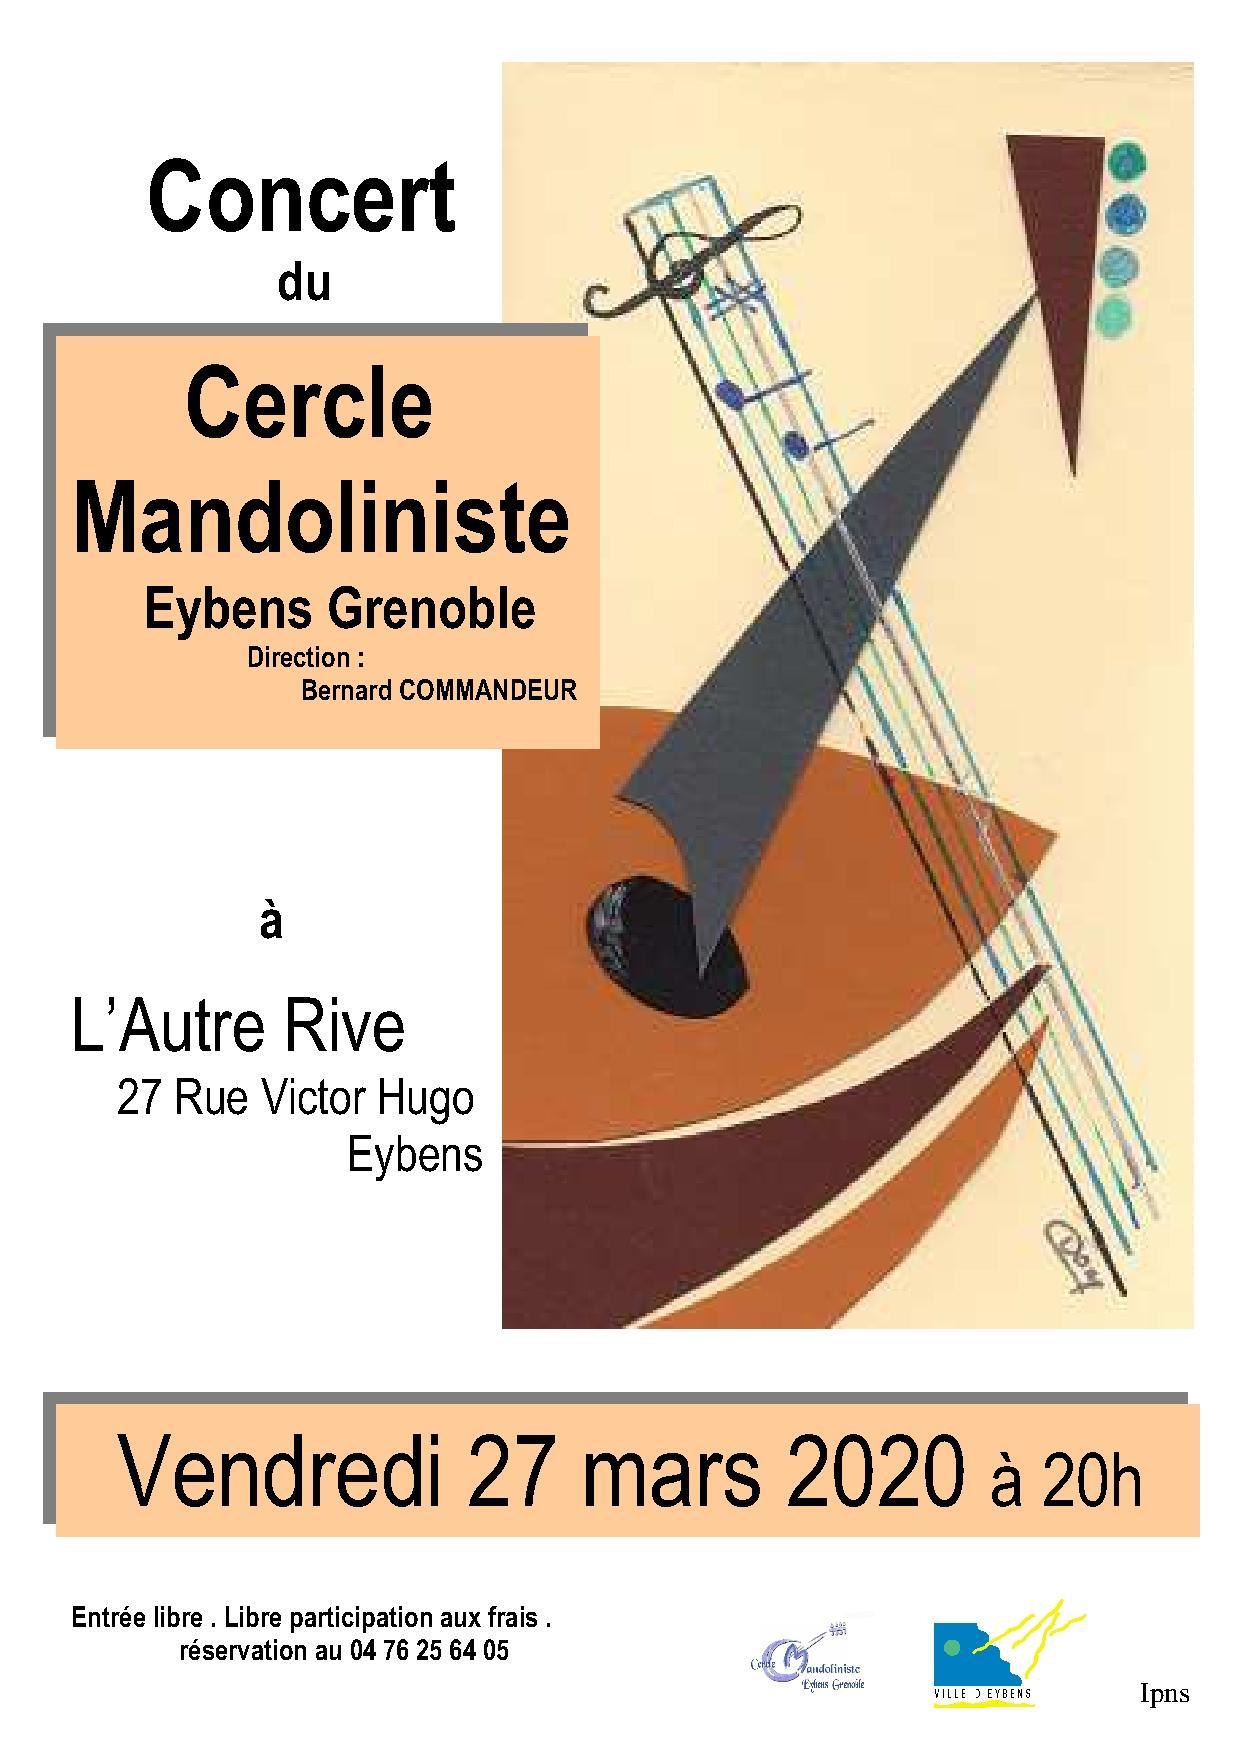 Concert du Cercle Mandoliniste d'Eybens Grenoble